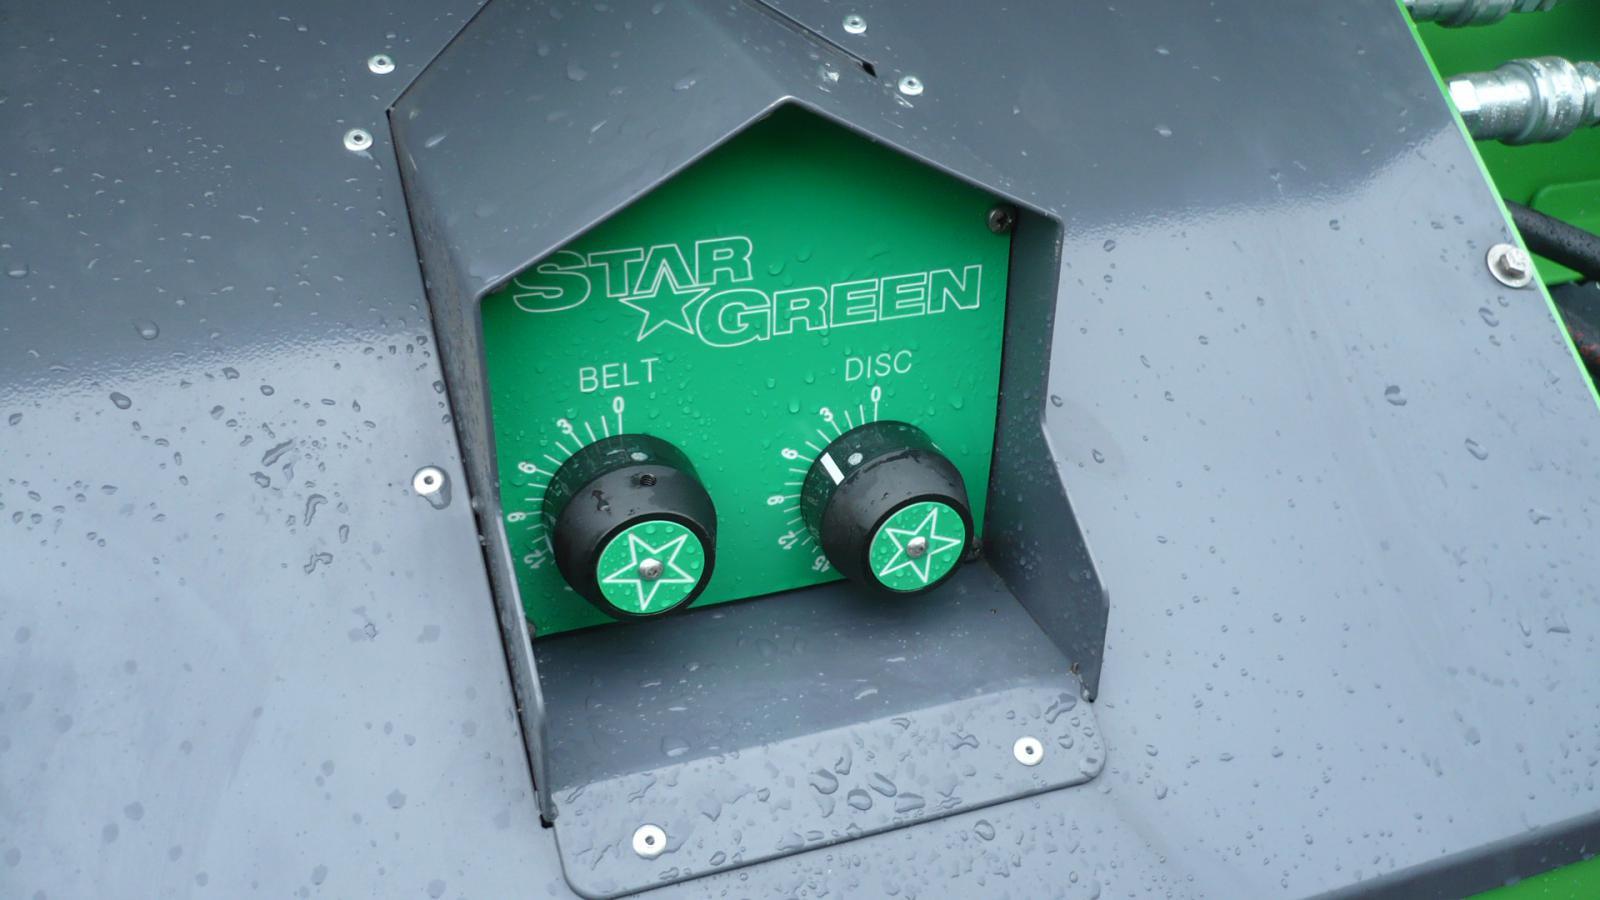 Manually adjustablebelt and disc controls on the TD700 STARGREEN UTV Demount Turf Care Top Dresser from VALE Engineering